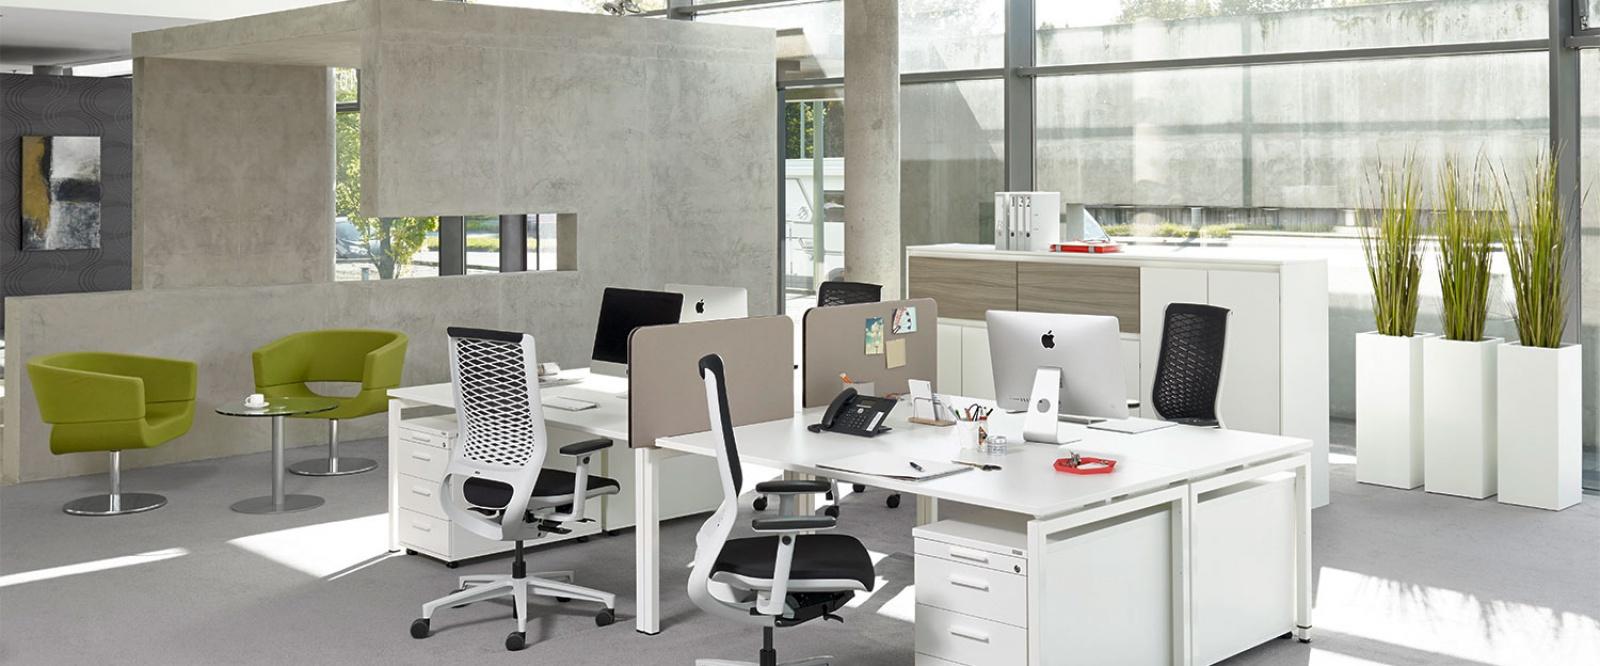 Büromöbel Hamburg Bürostühle Schreibtische Sitzmöbel | BK